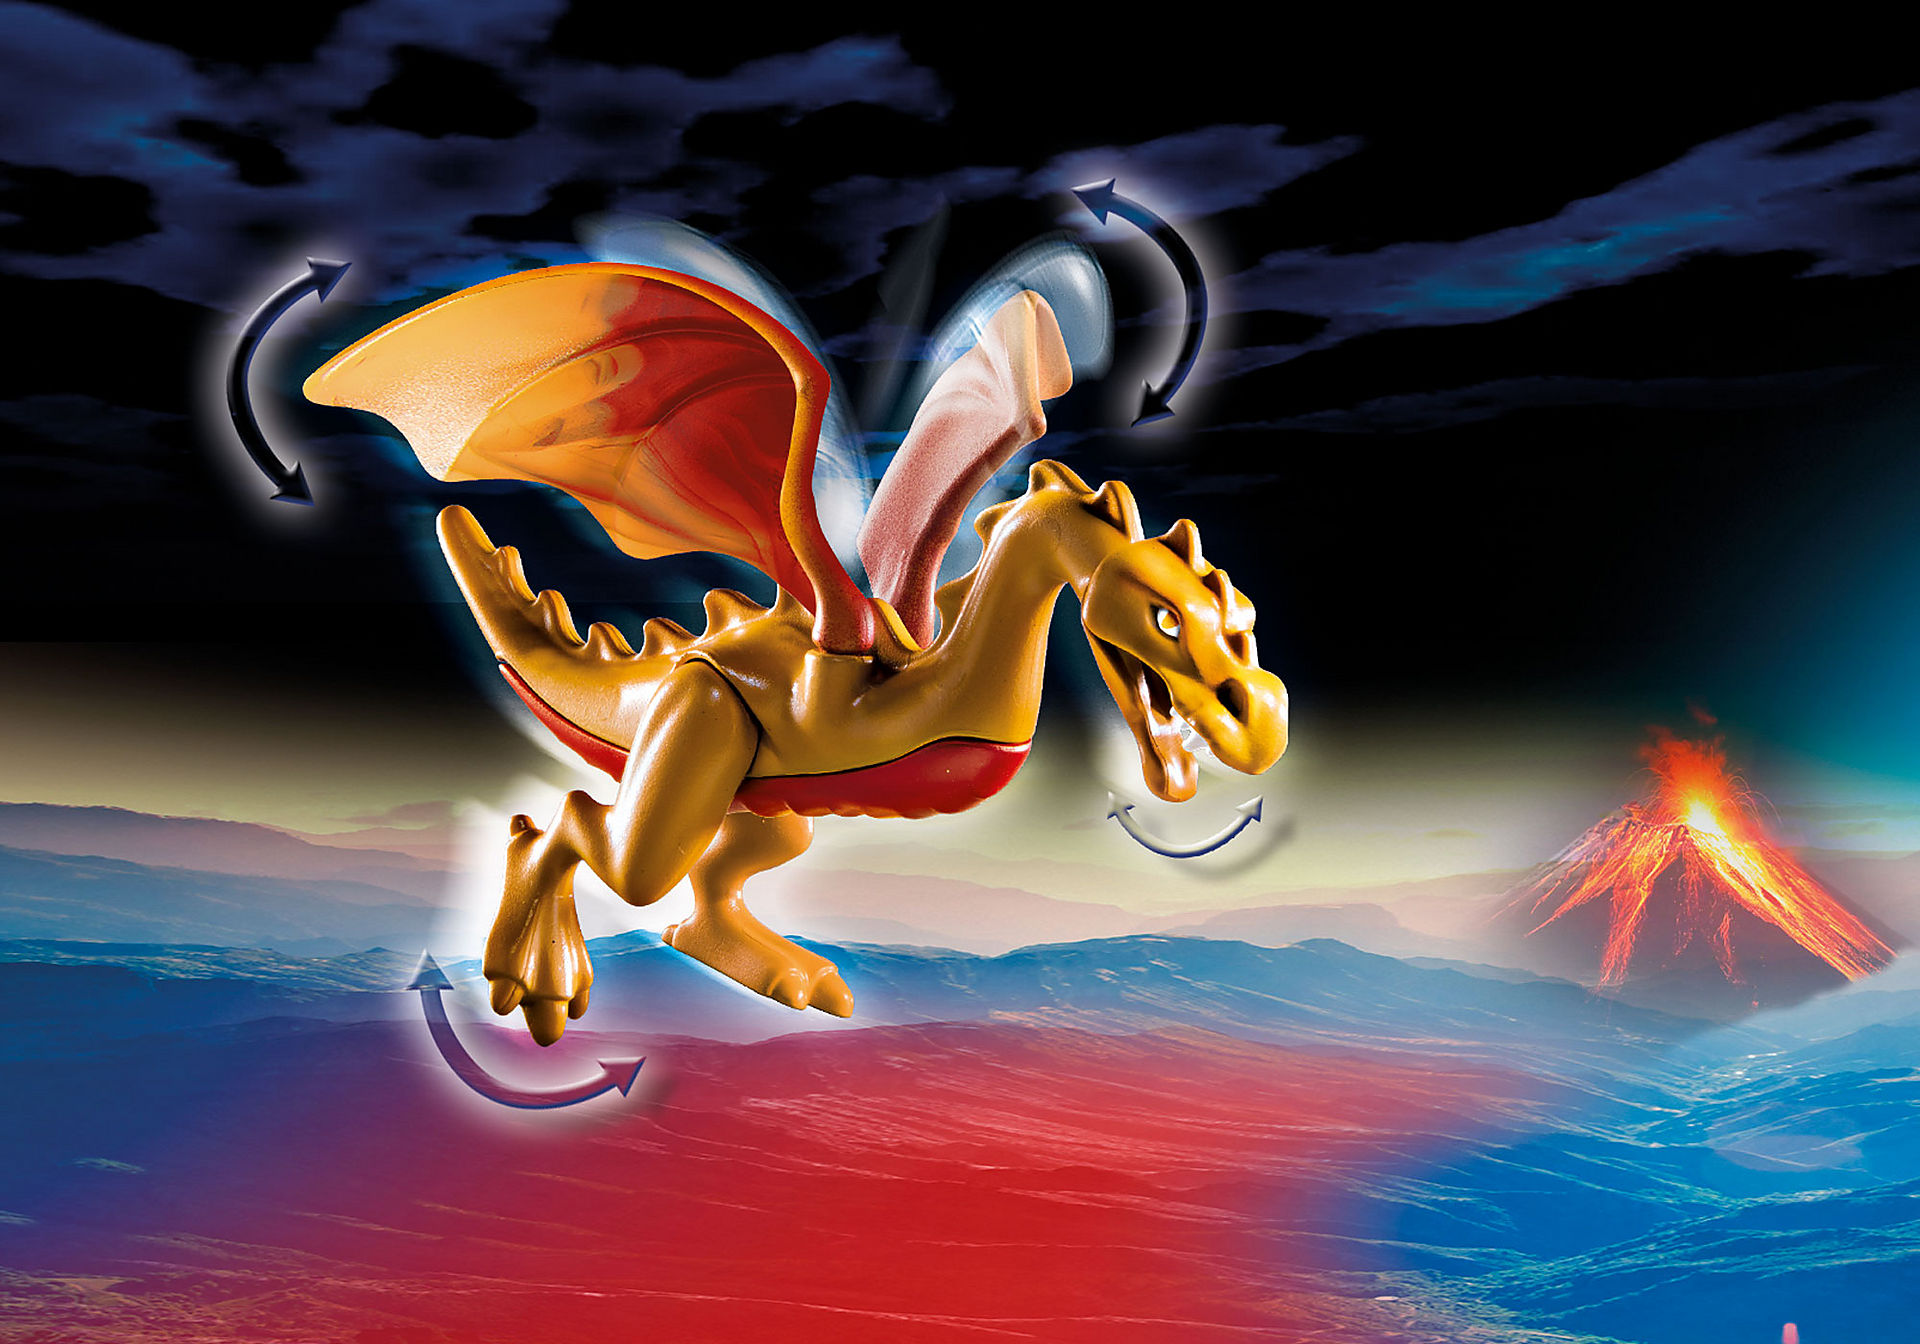 70226 Burnham Raiders et dragon doré zoom image5